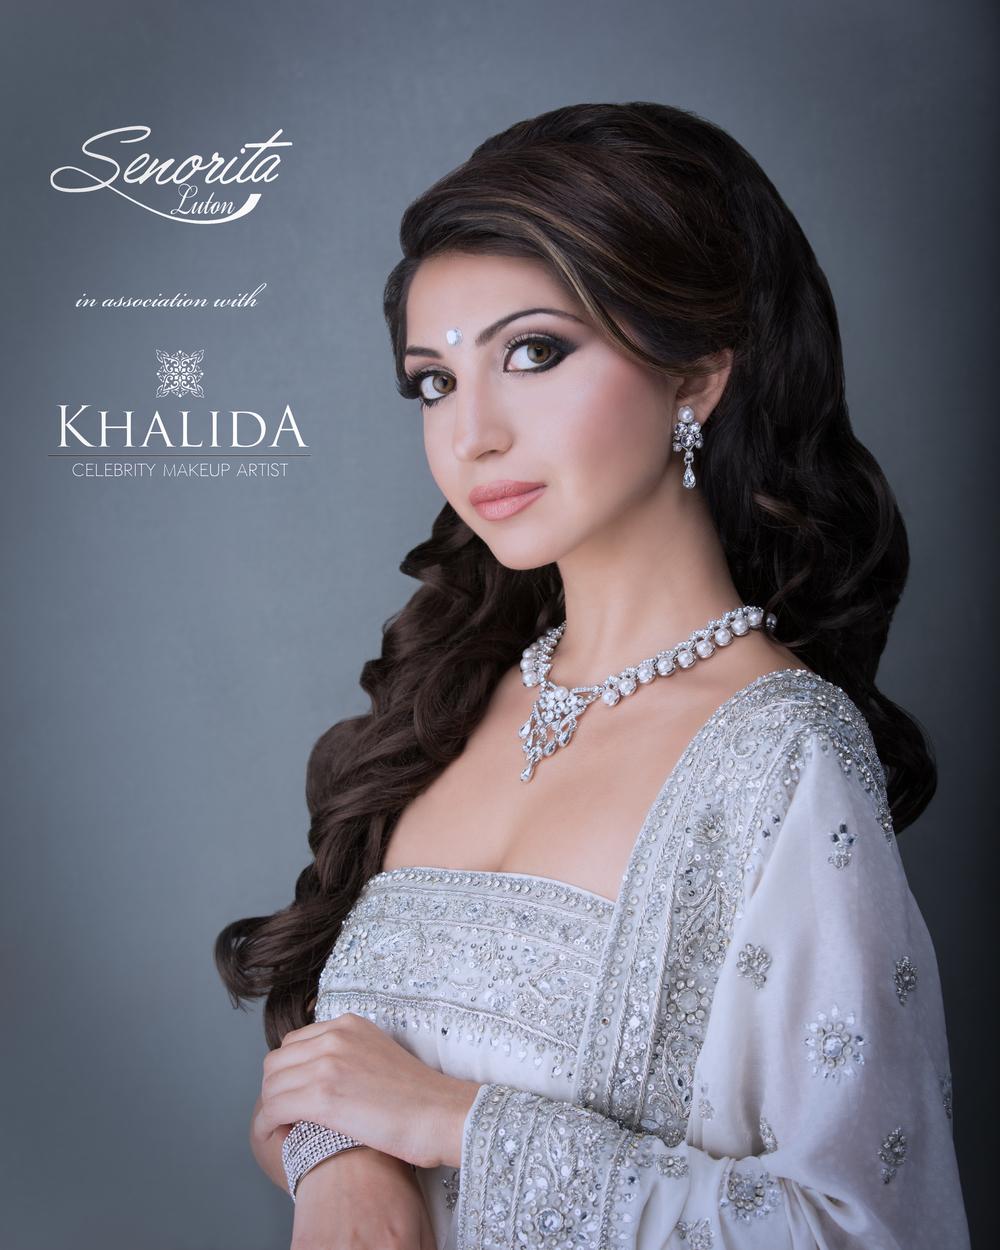 Model: Priyanka  Makeup: Khalida Makeup Artist  Client: Seno Rita (Senorita)  Stylist: Haroon